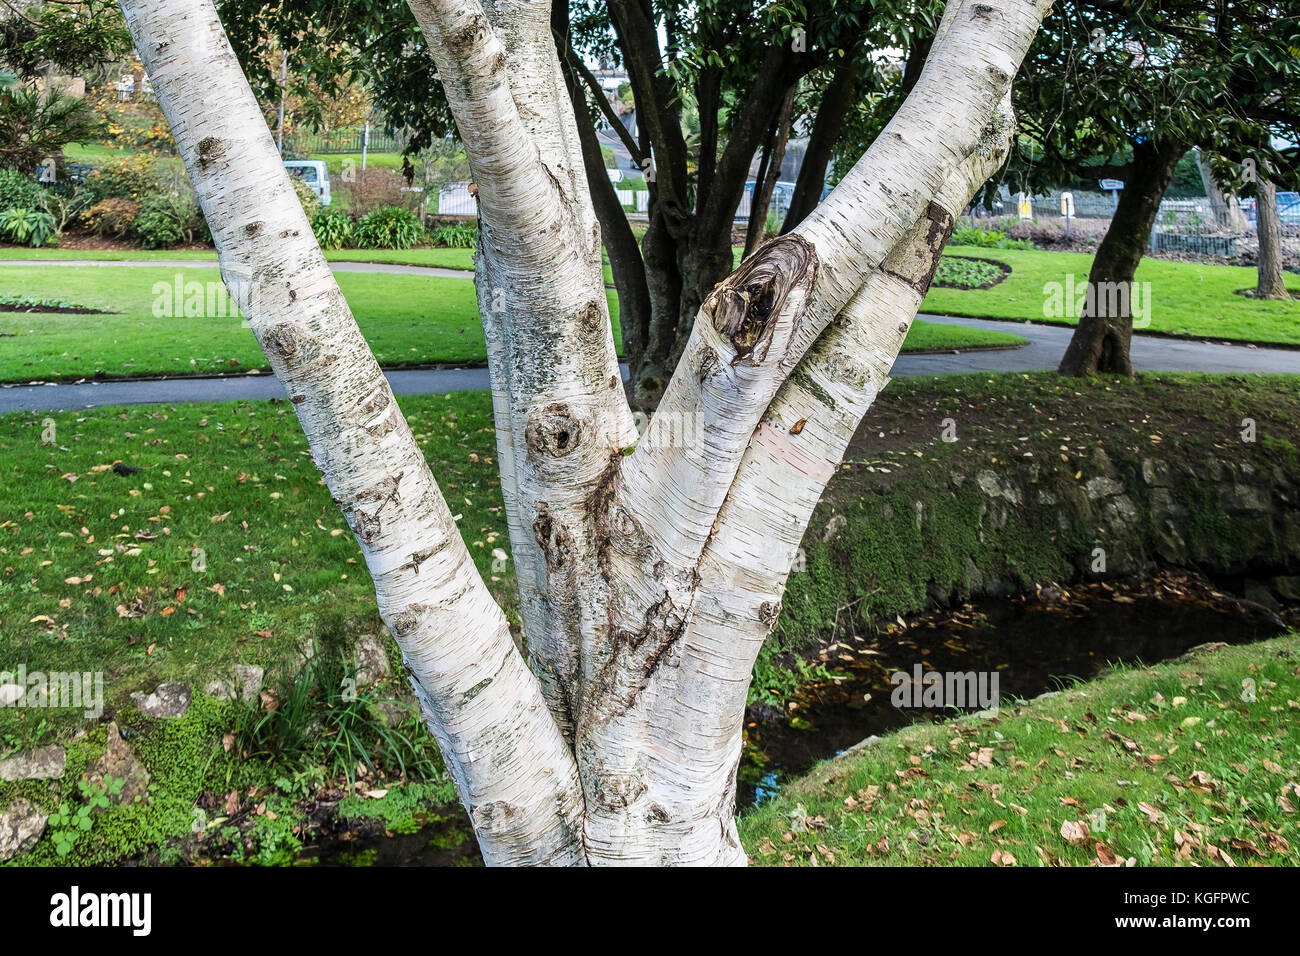 The trunk of a Silver Birch tree Betula pendula - Stock Image